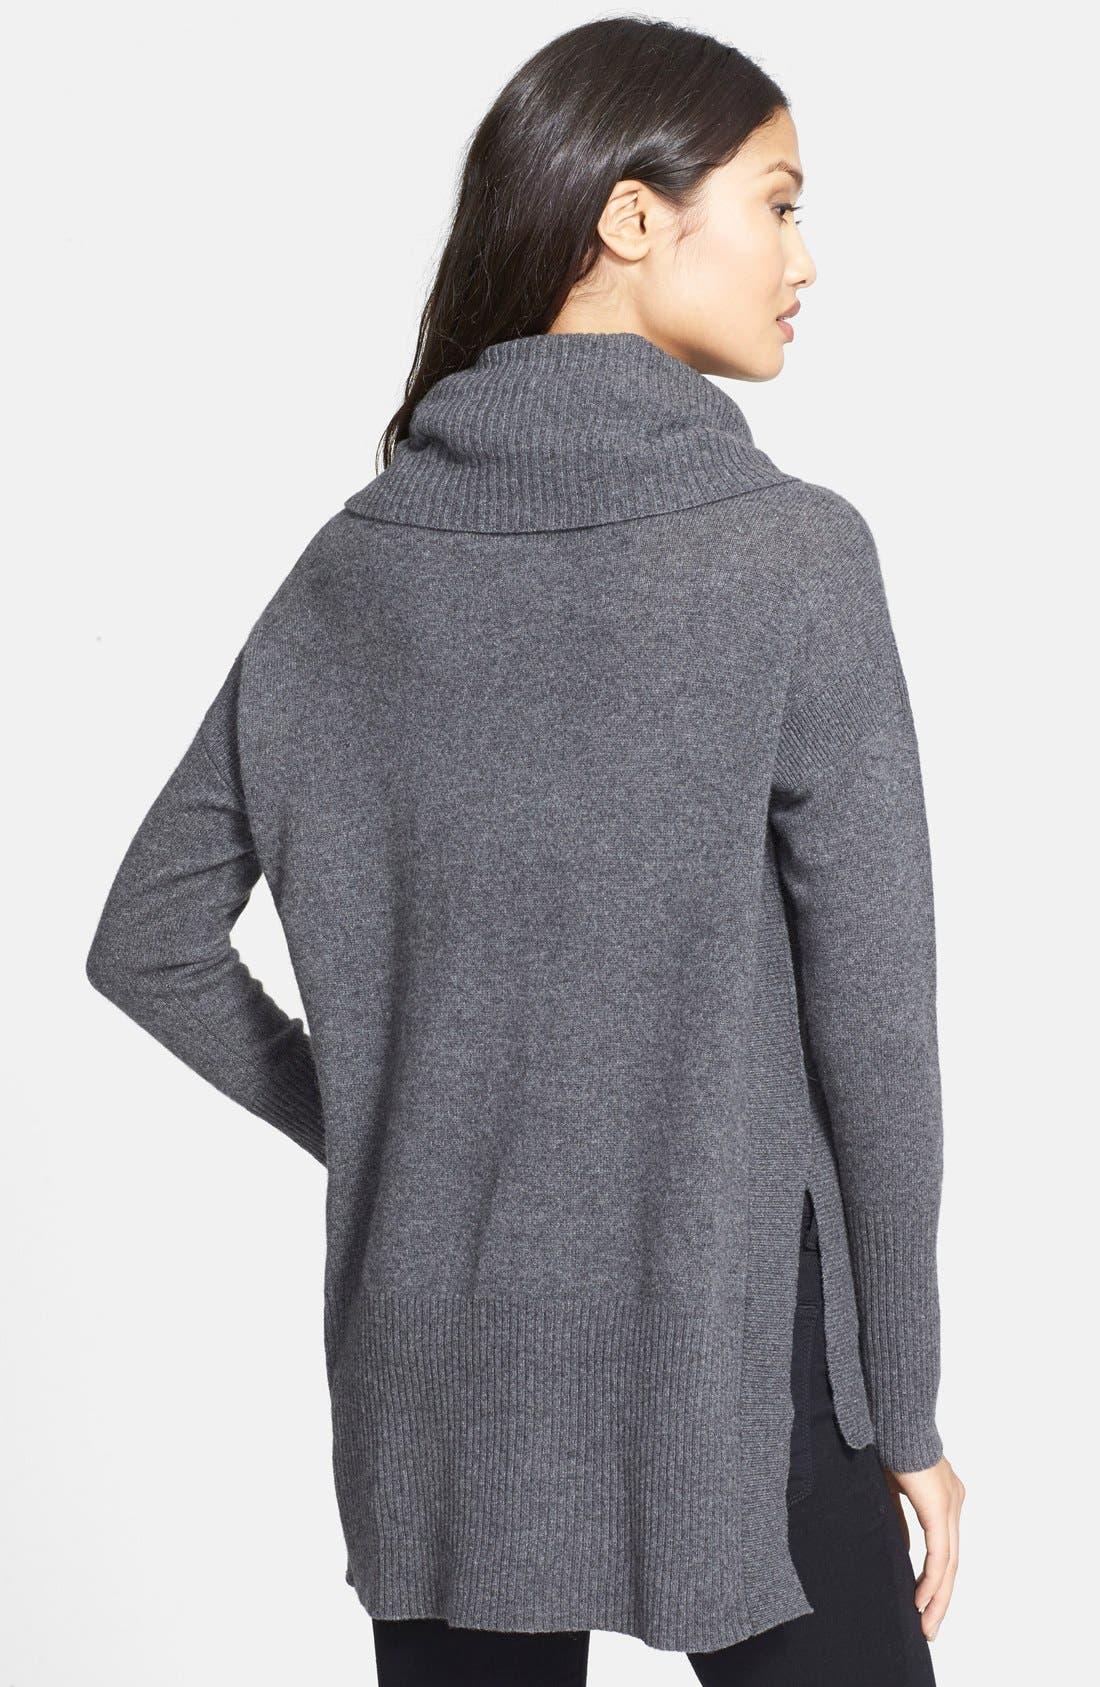 'Ahiga' Turtleneck Sweater,                             Alternate thumbnail 2, color,                             Medium Grey